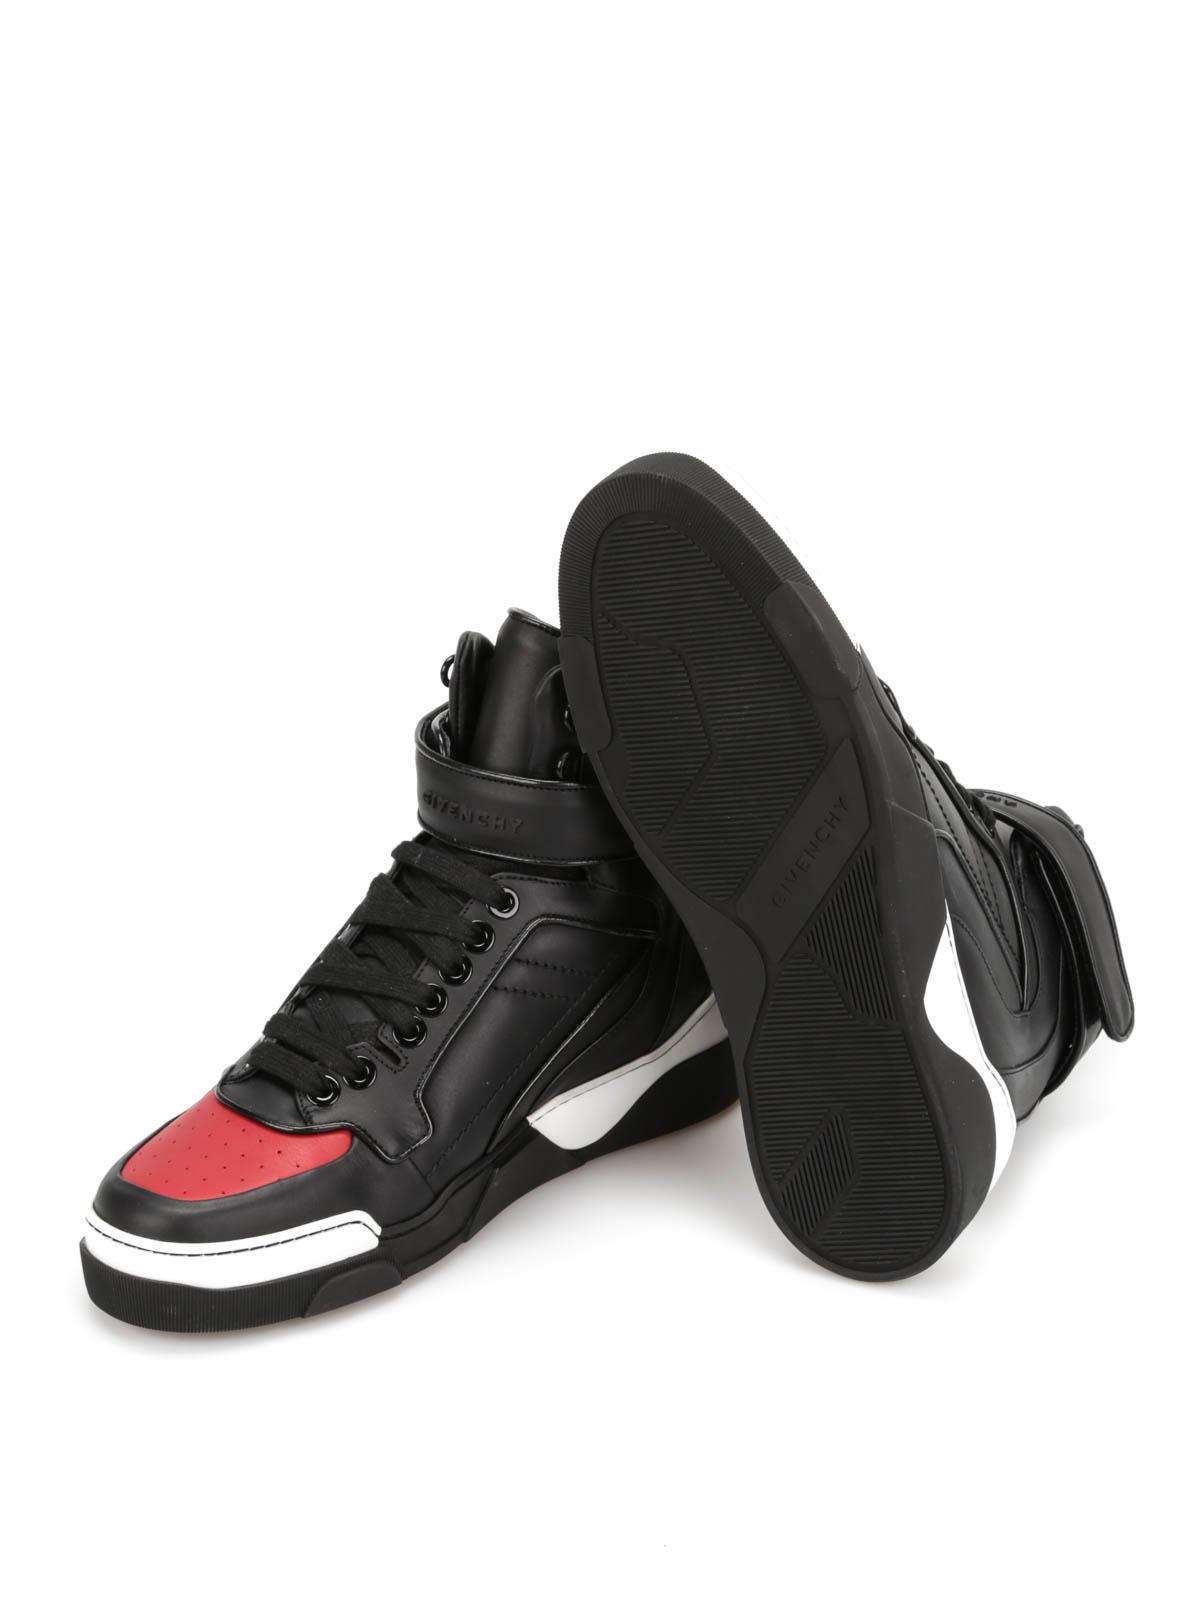 Chaussures - High-tops Et Chaussures De Sport Saint Laurent im3L7sKn